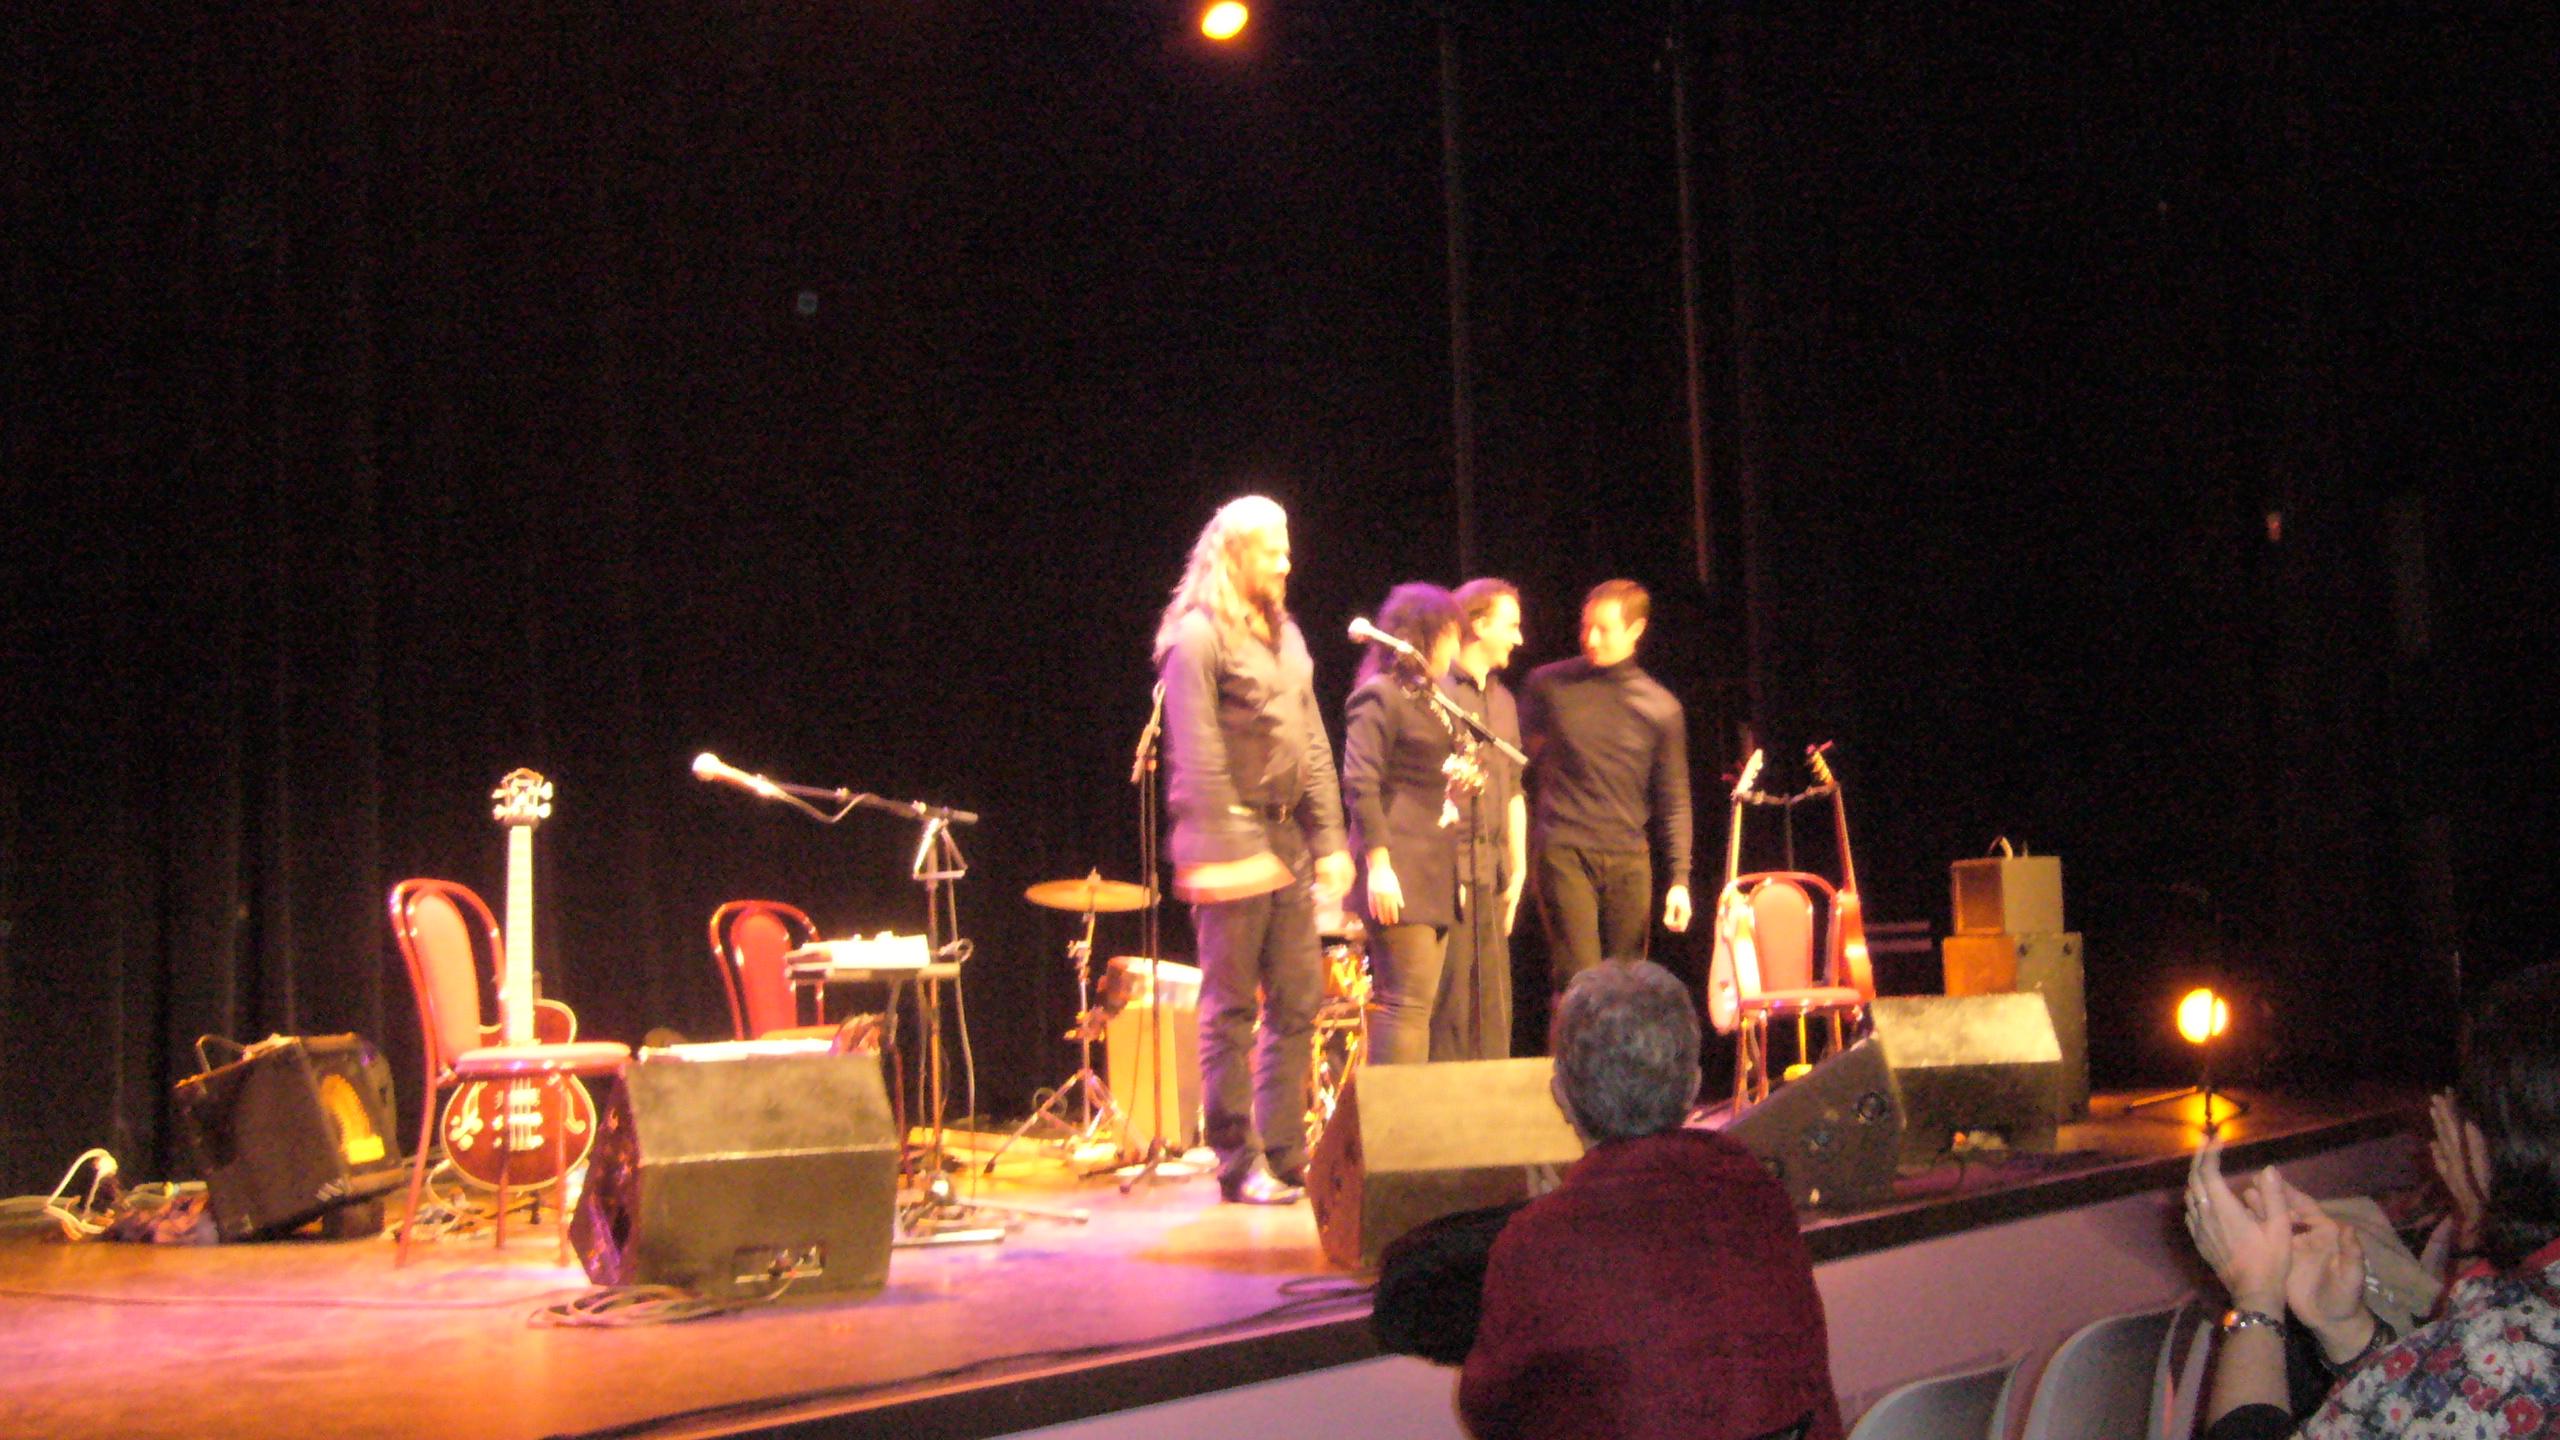 La fusion Jazz-Flamenco réussie de La Ultima !